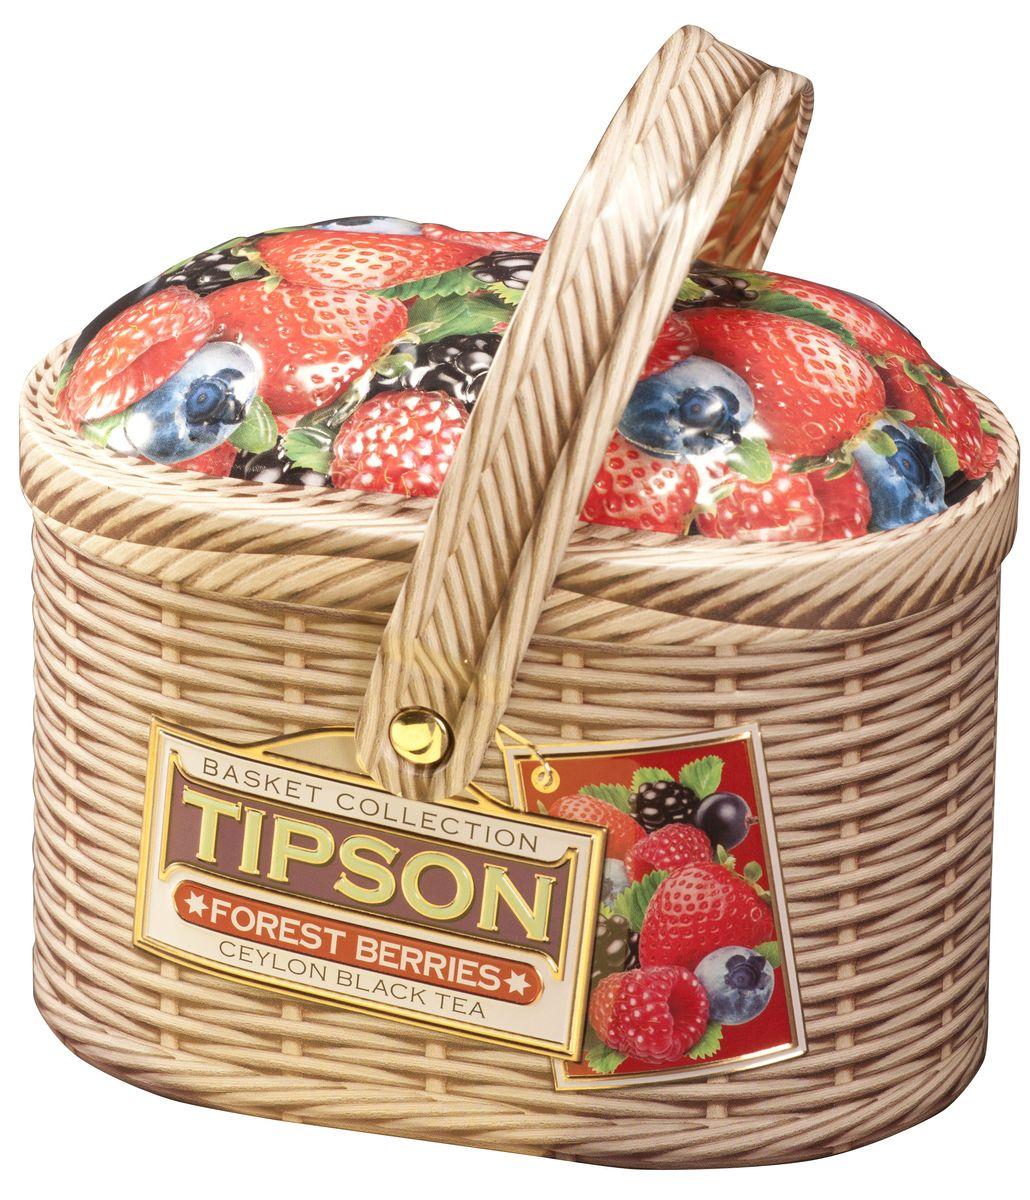 Tipson Forest Berries черный листовой чай, 100 г (жестяная банка) tipson pearl зеленый листовой чай 75 г жестяная банка